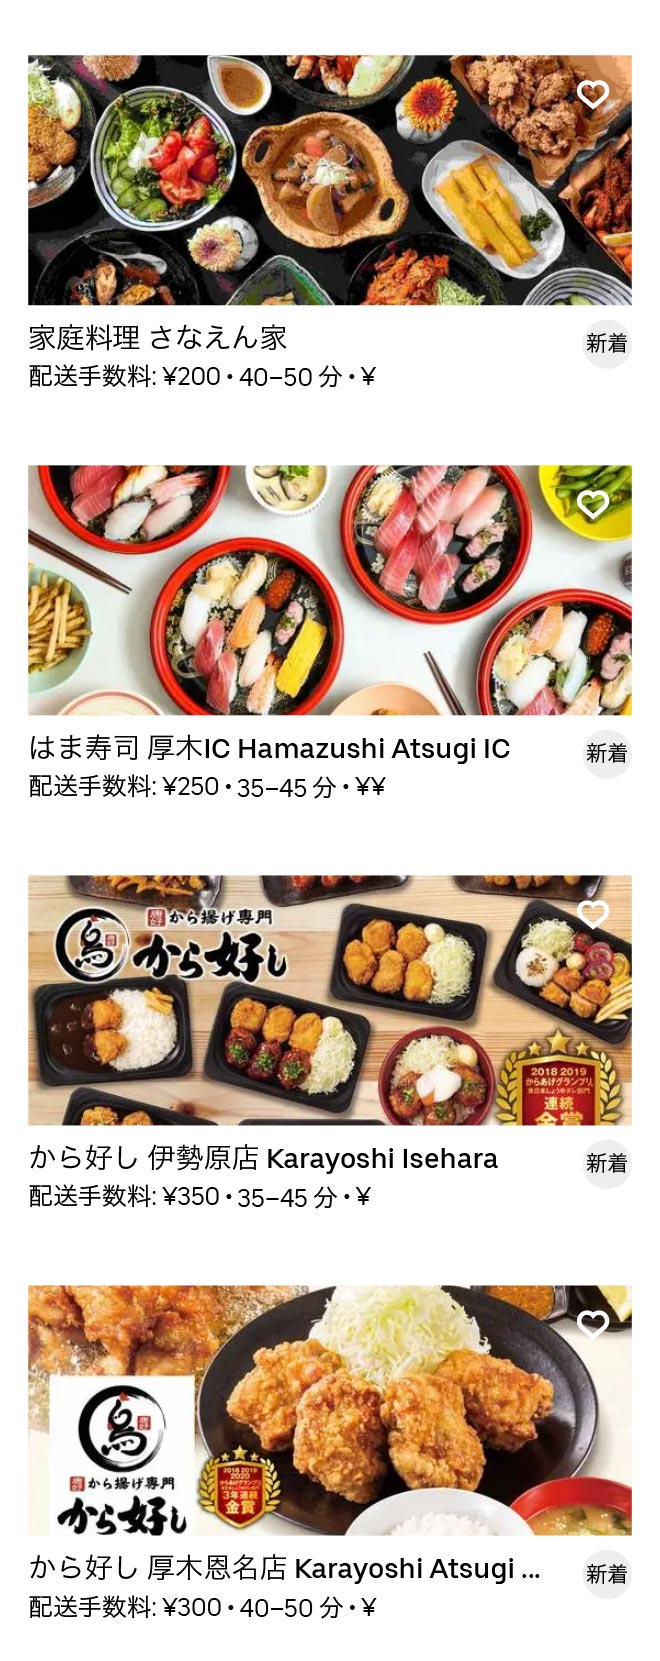 Aiko ishida menu 2010 02